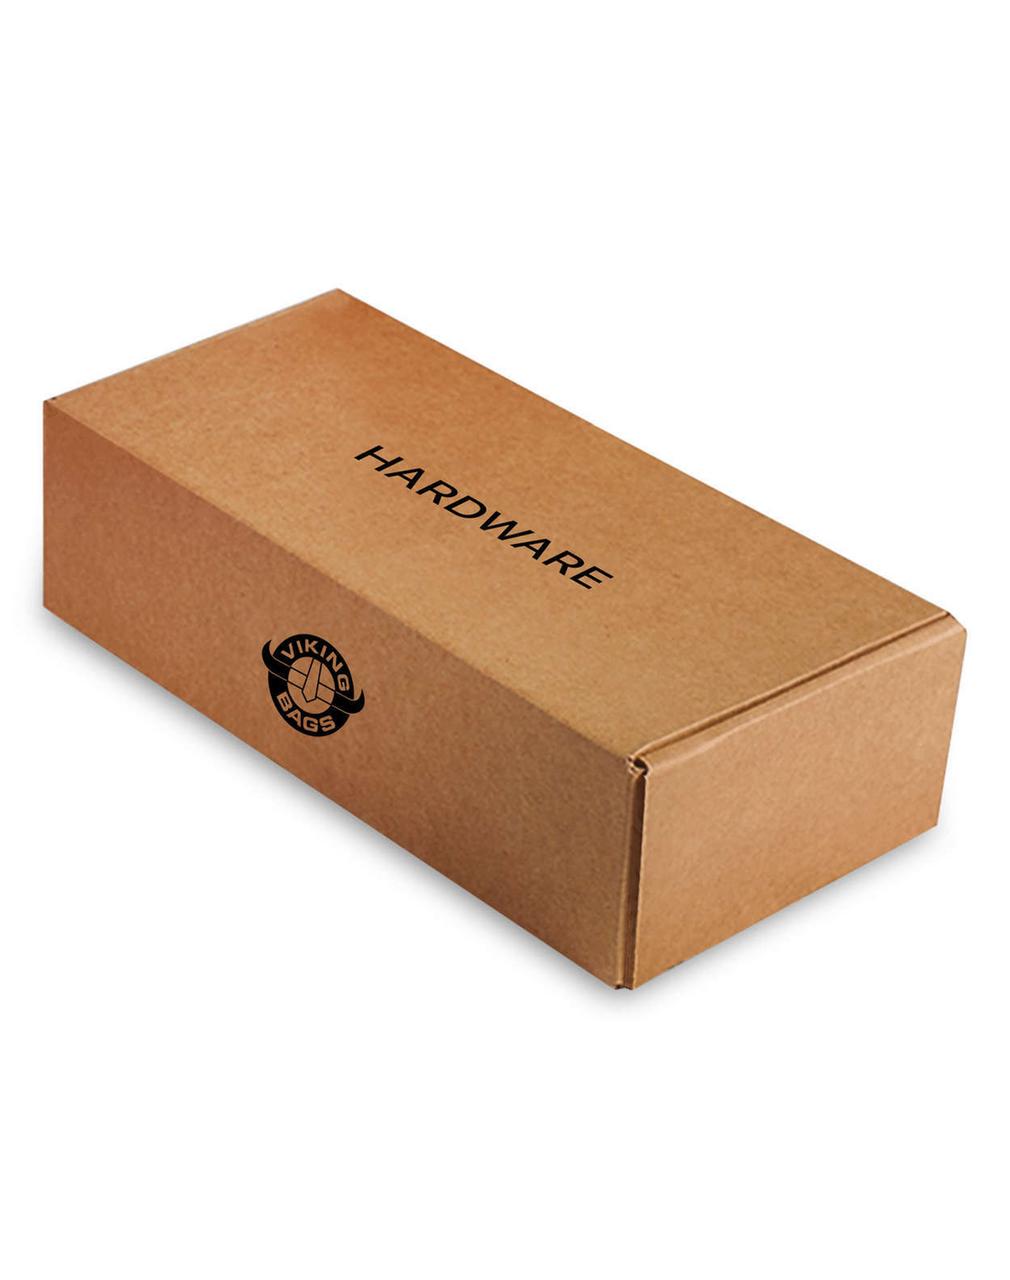 Triumph Thunderbird Viking Lamellar Leather Covered Shock Cutout Hard Saddlebags Box